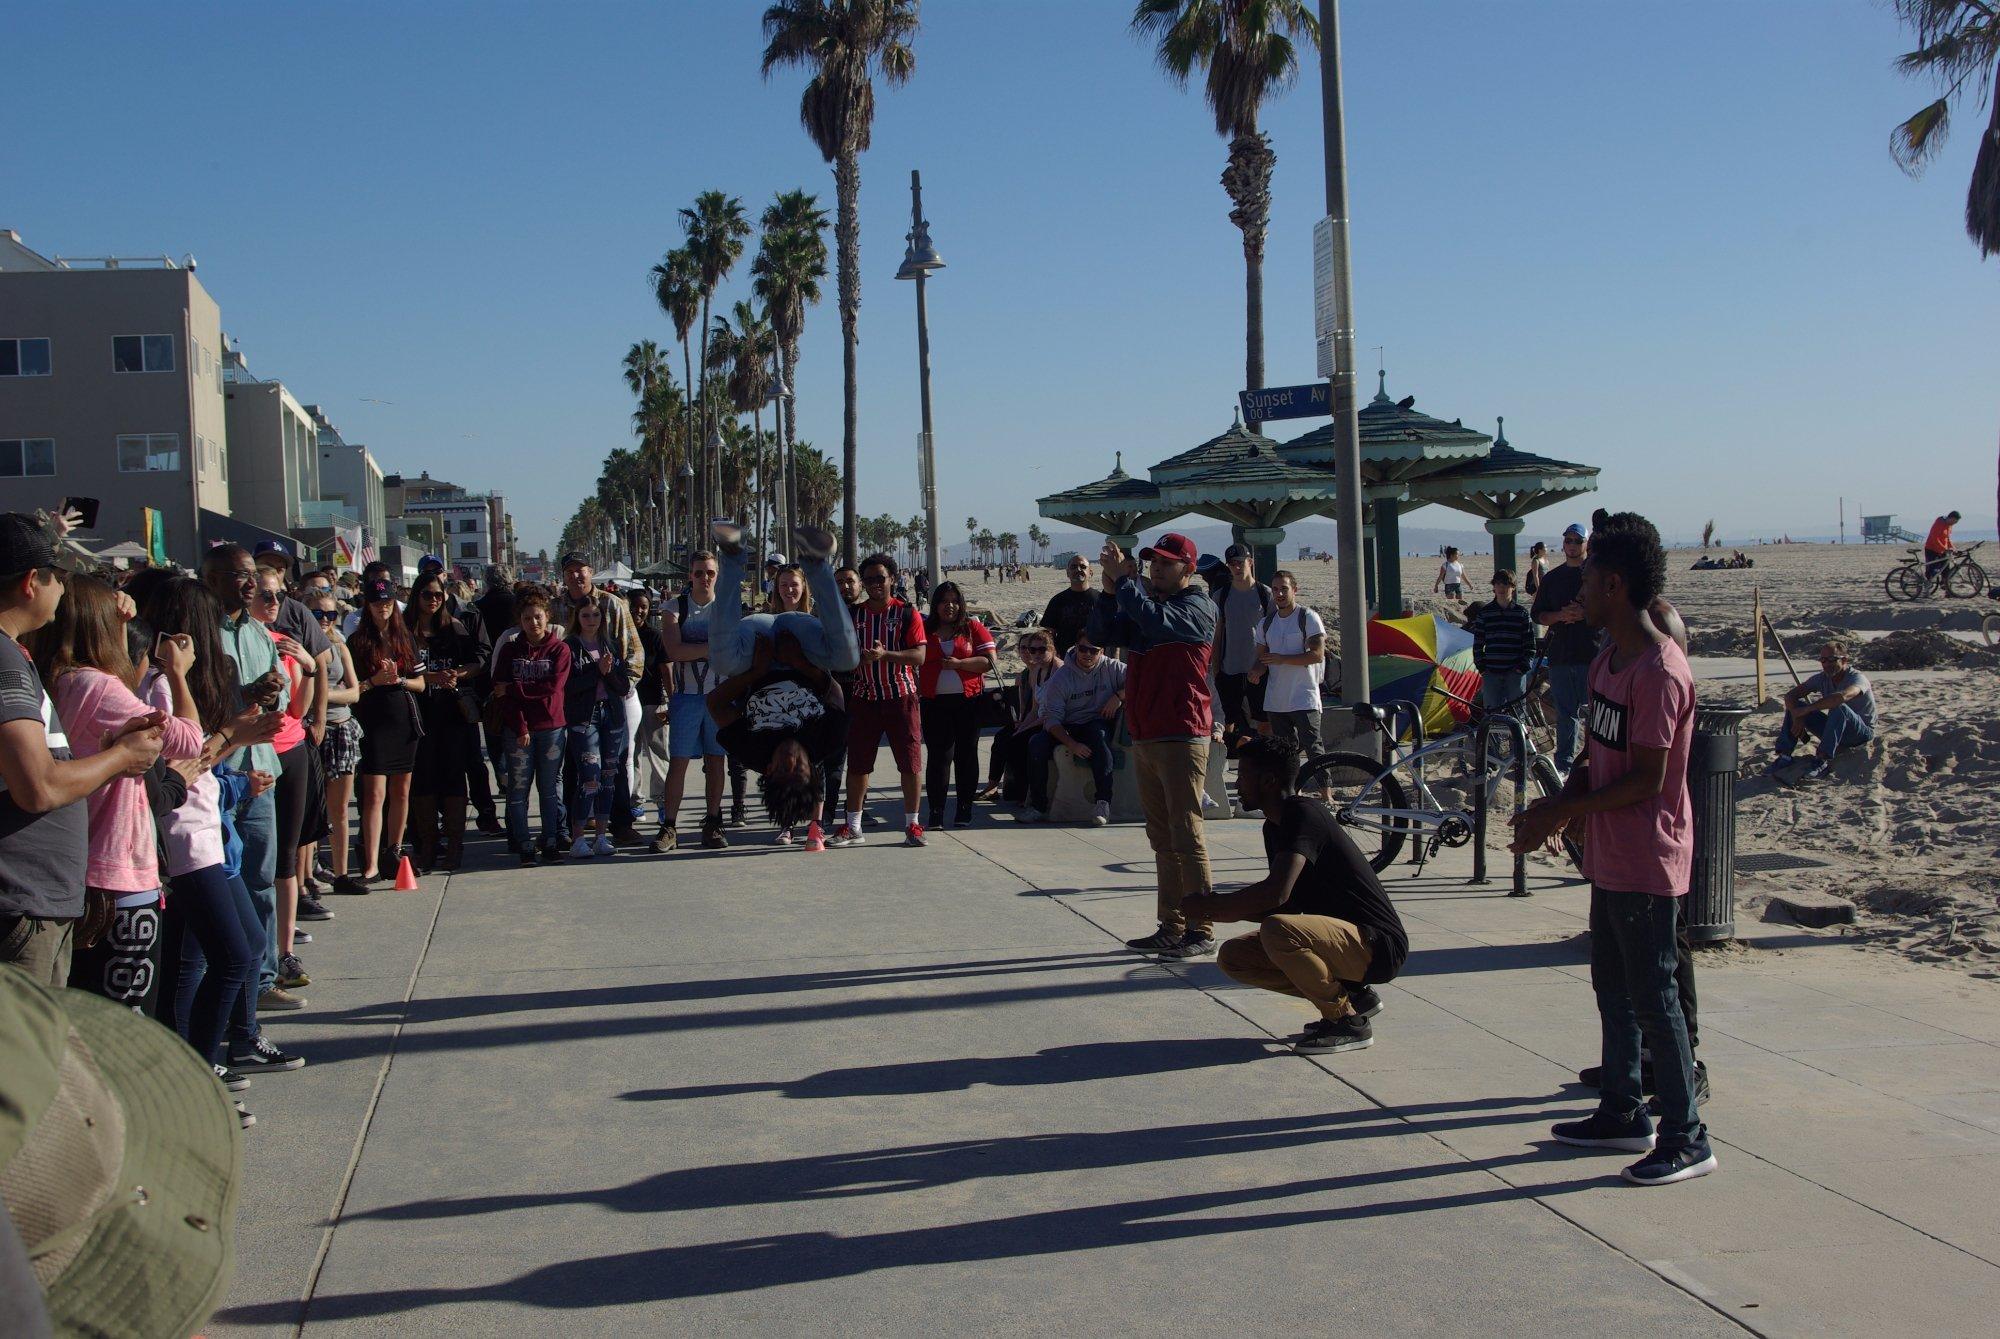 Venice beach, breakdancer in flight :) (Pentax K10D)